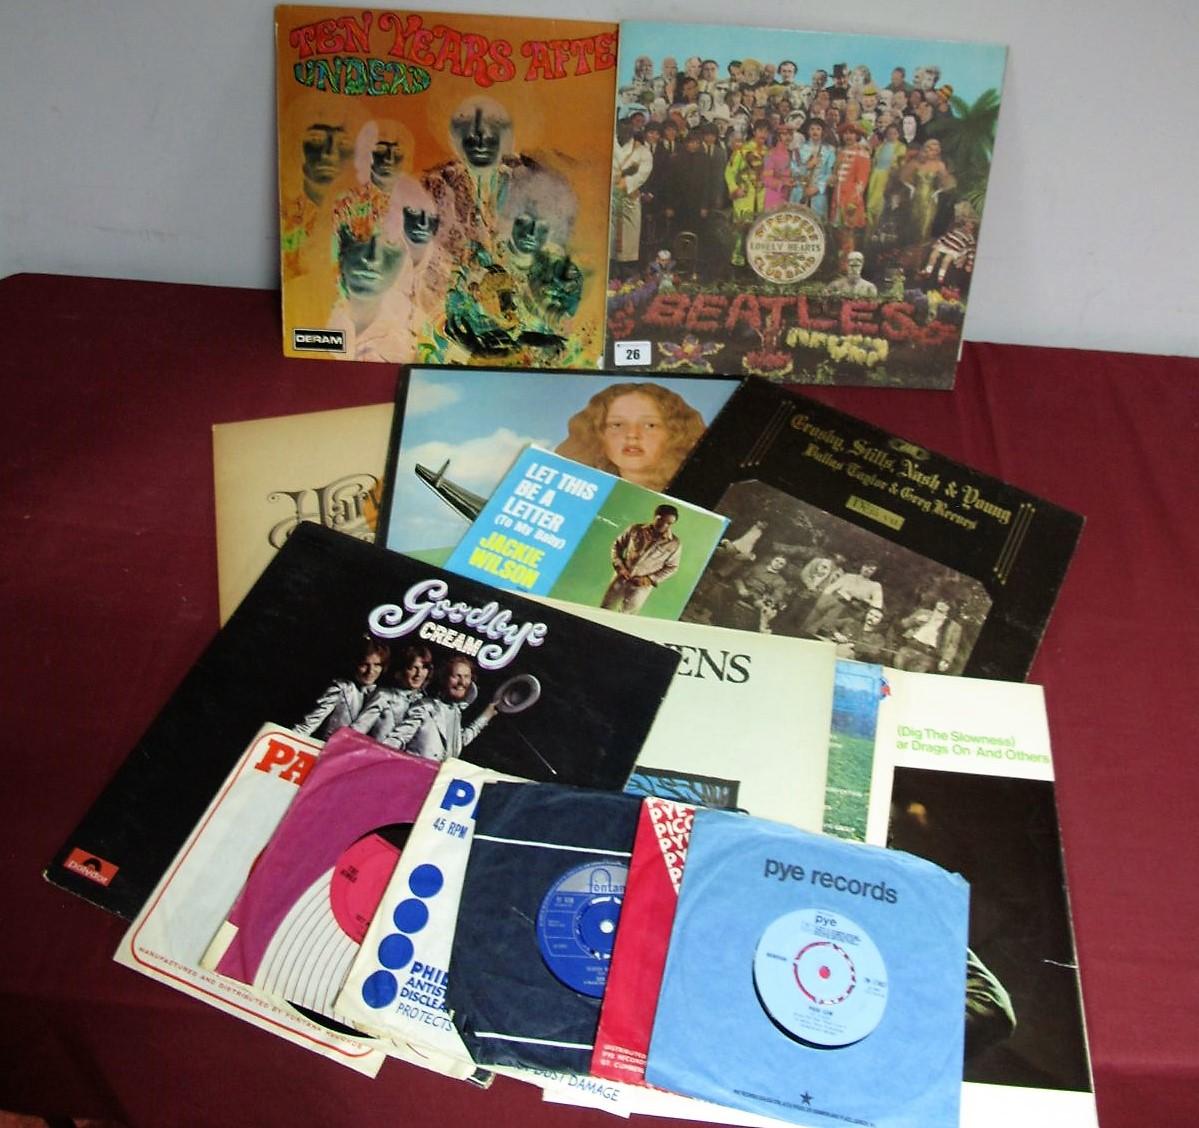 Lot 26 - Rock and Pop LP's, to include Neil Young 'Harvest', Crosby Stills 'Deja Vu', Cream 'Goodbye', Ten